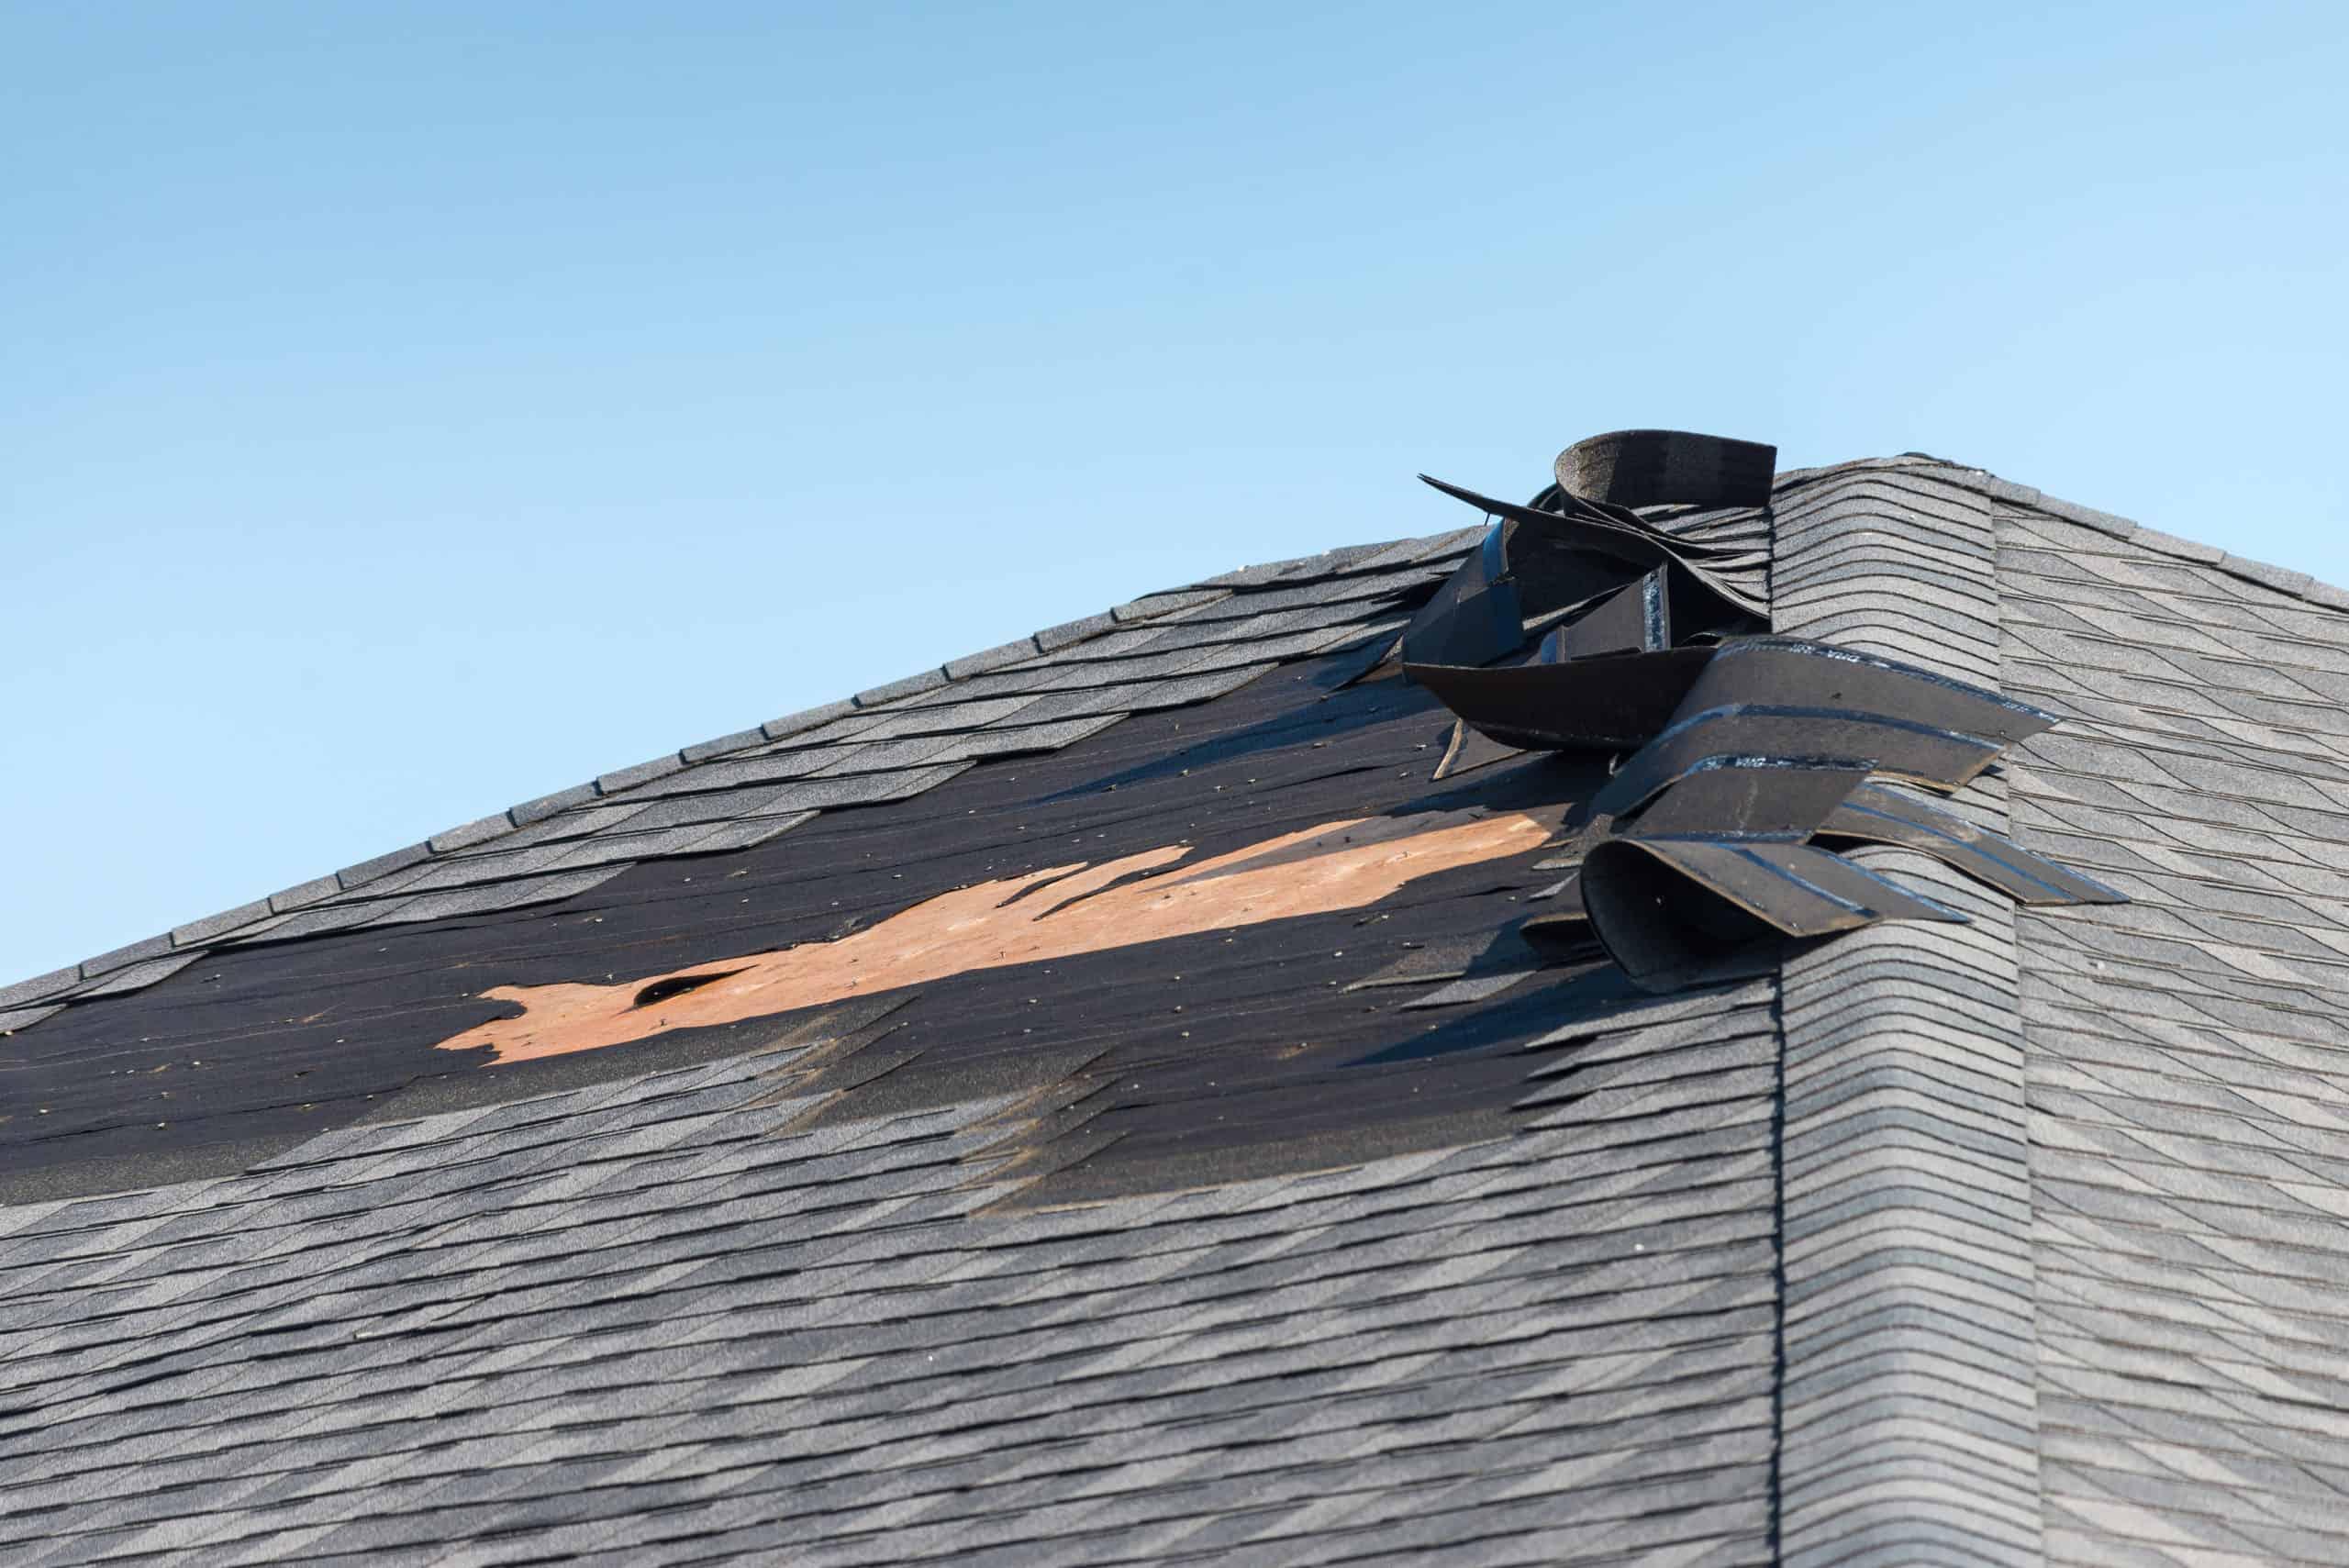 Asphalt shingle roof with wind damage